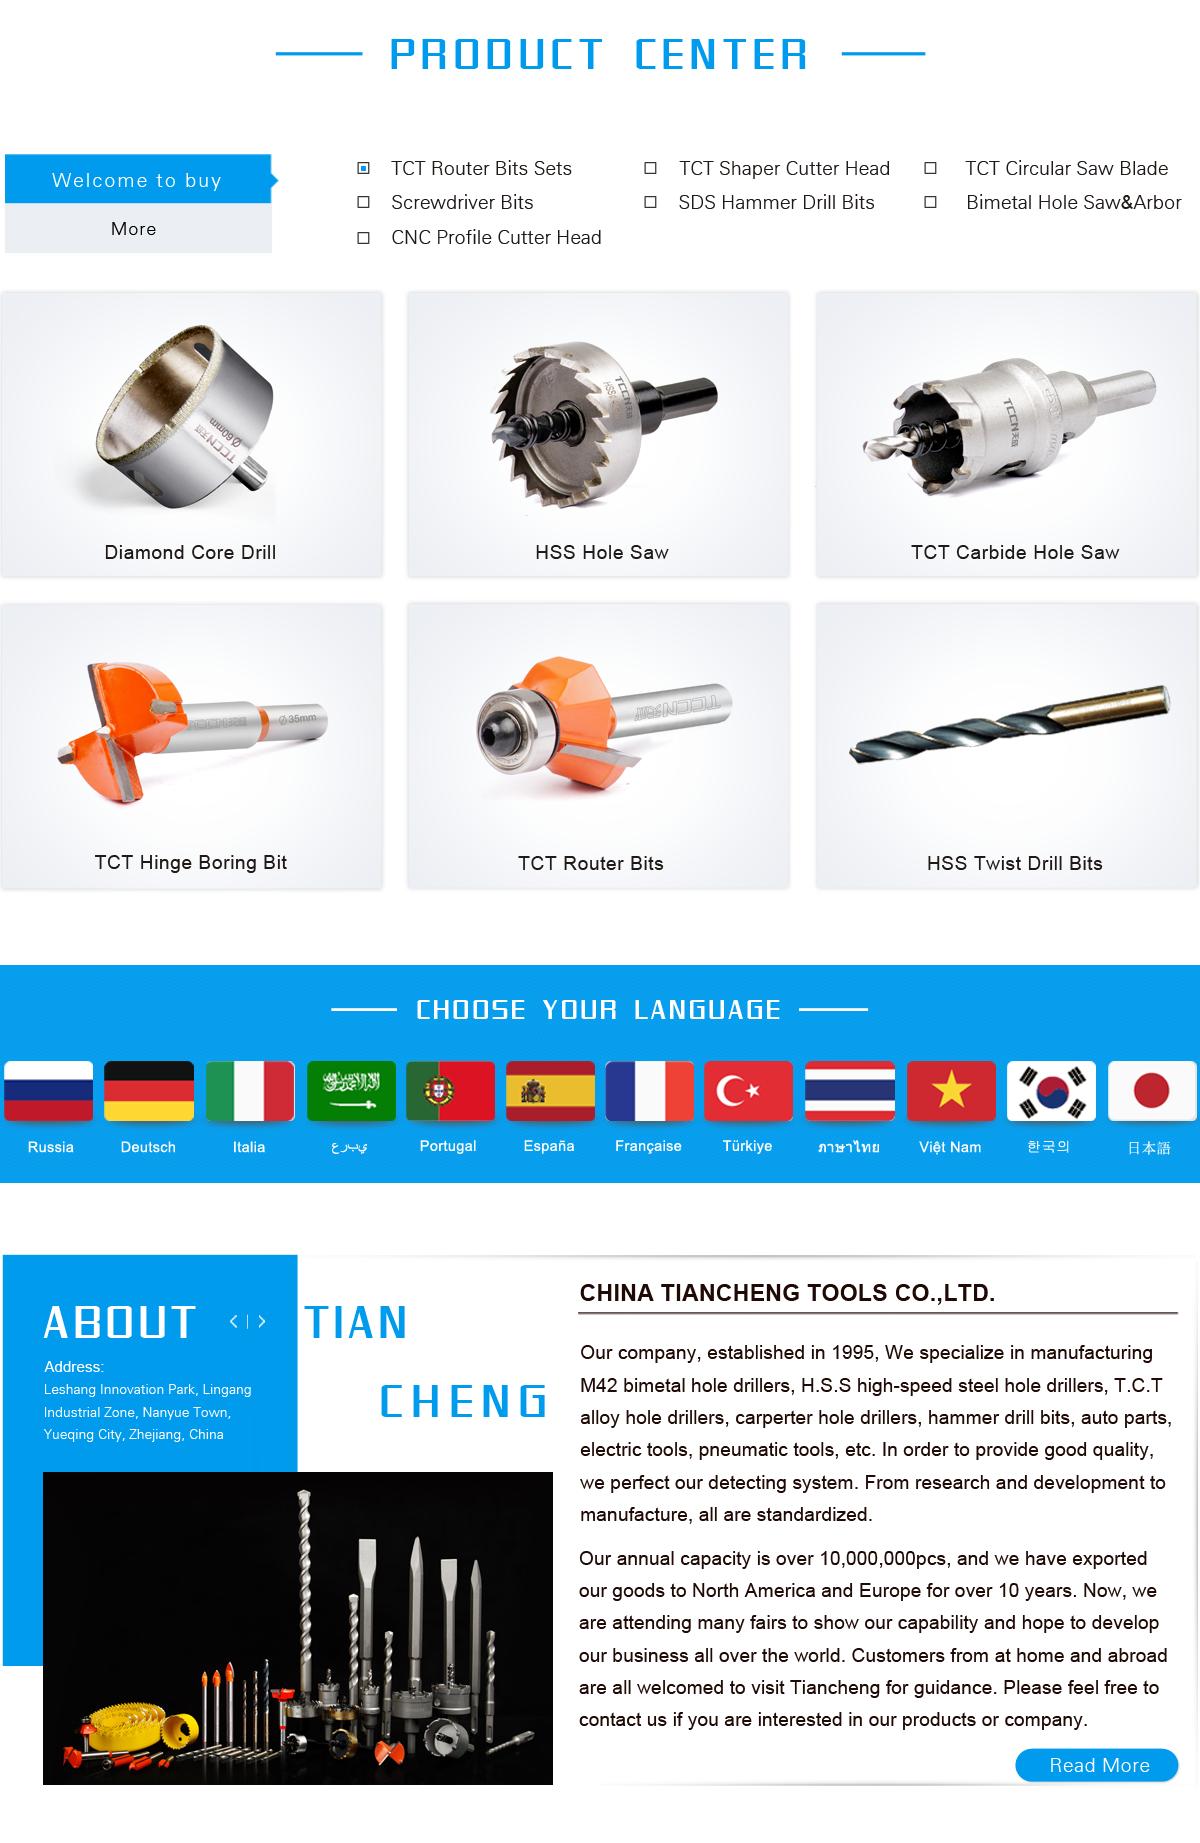 Tiancheng Tools Co., Ltd. - auto parts, hole saw